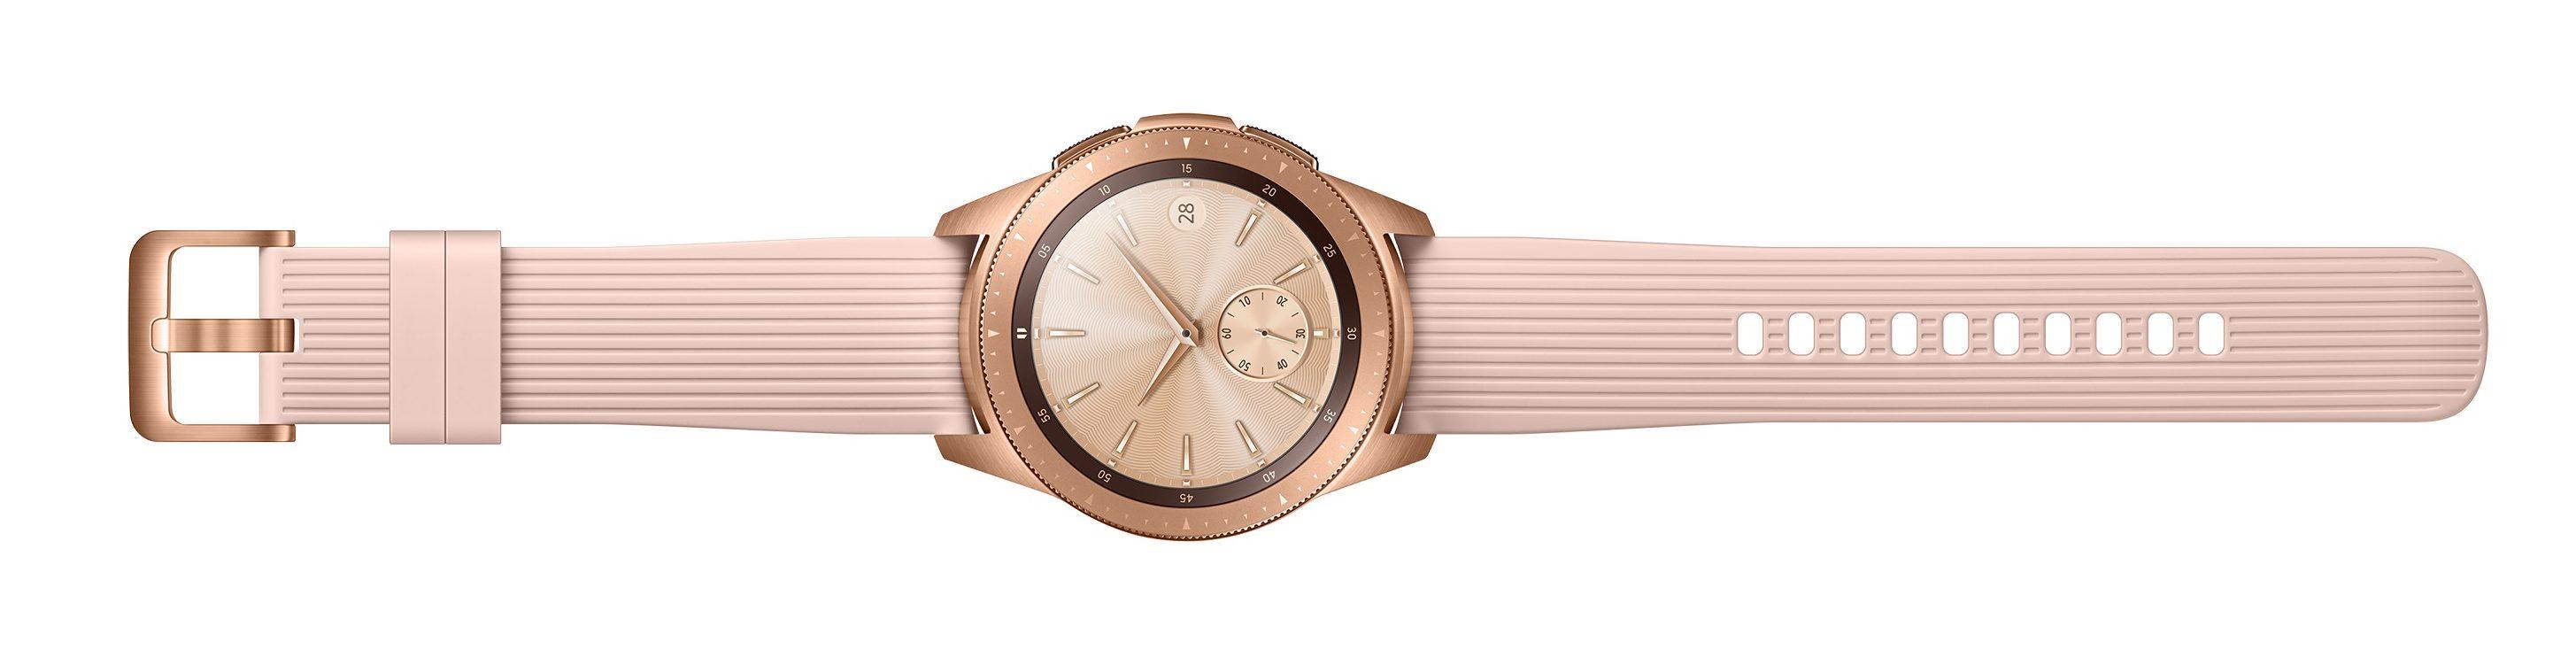 Samsung Galaxy Watch Rosa Dorado Largo